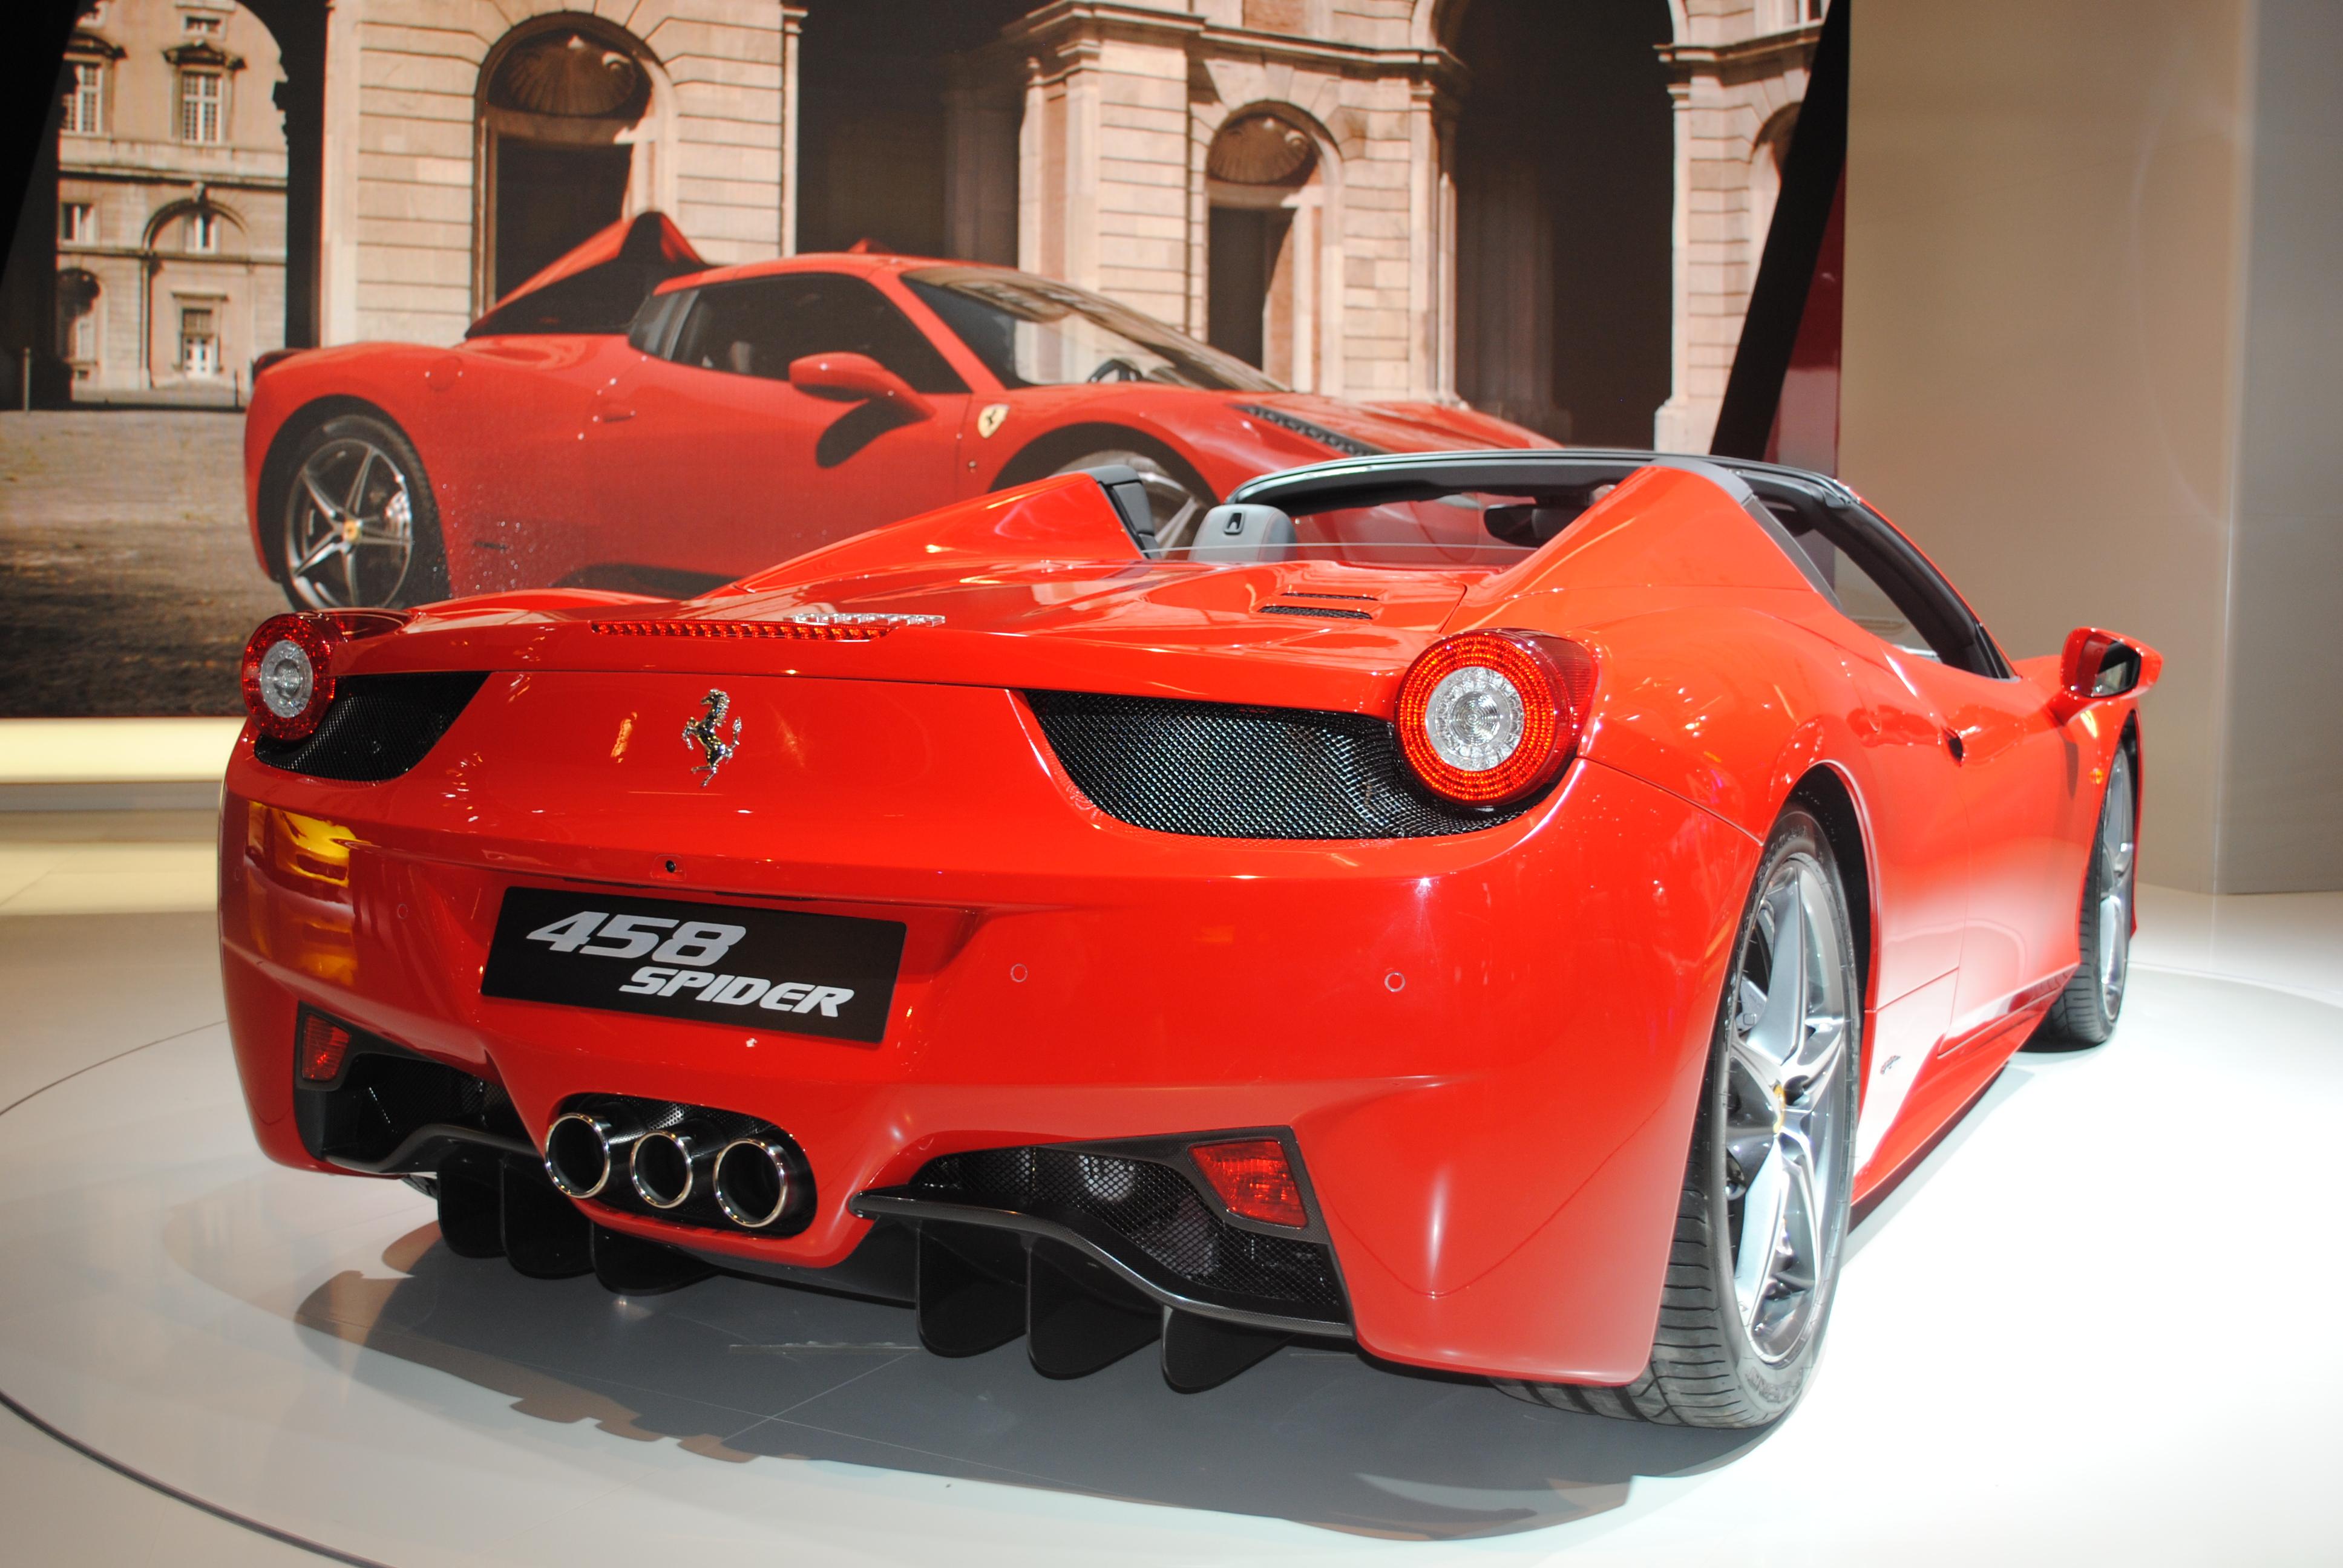 File:Ferrari 458 Spider (6143719925).jpg - Wikimedia Commons